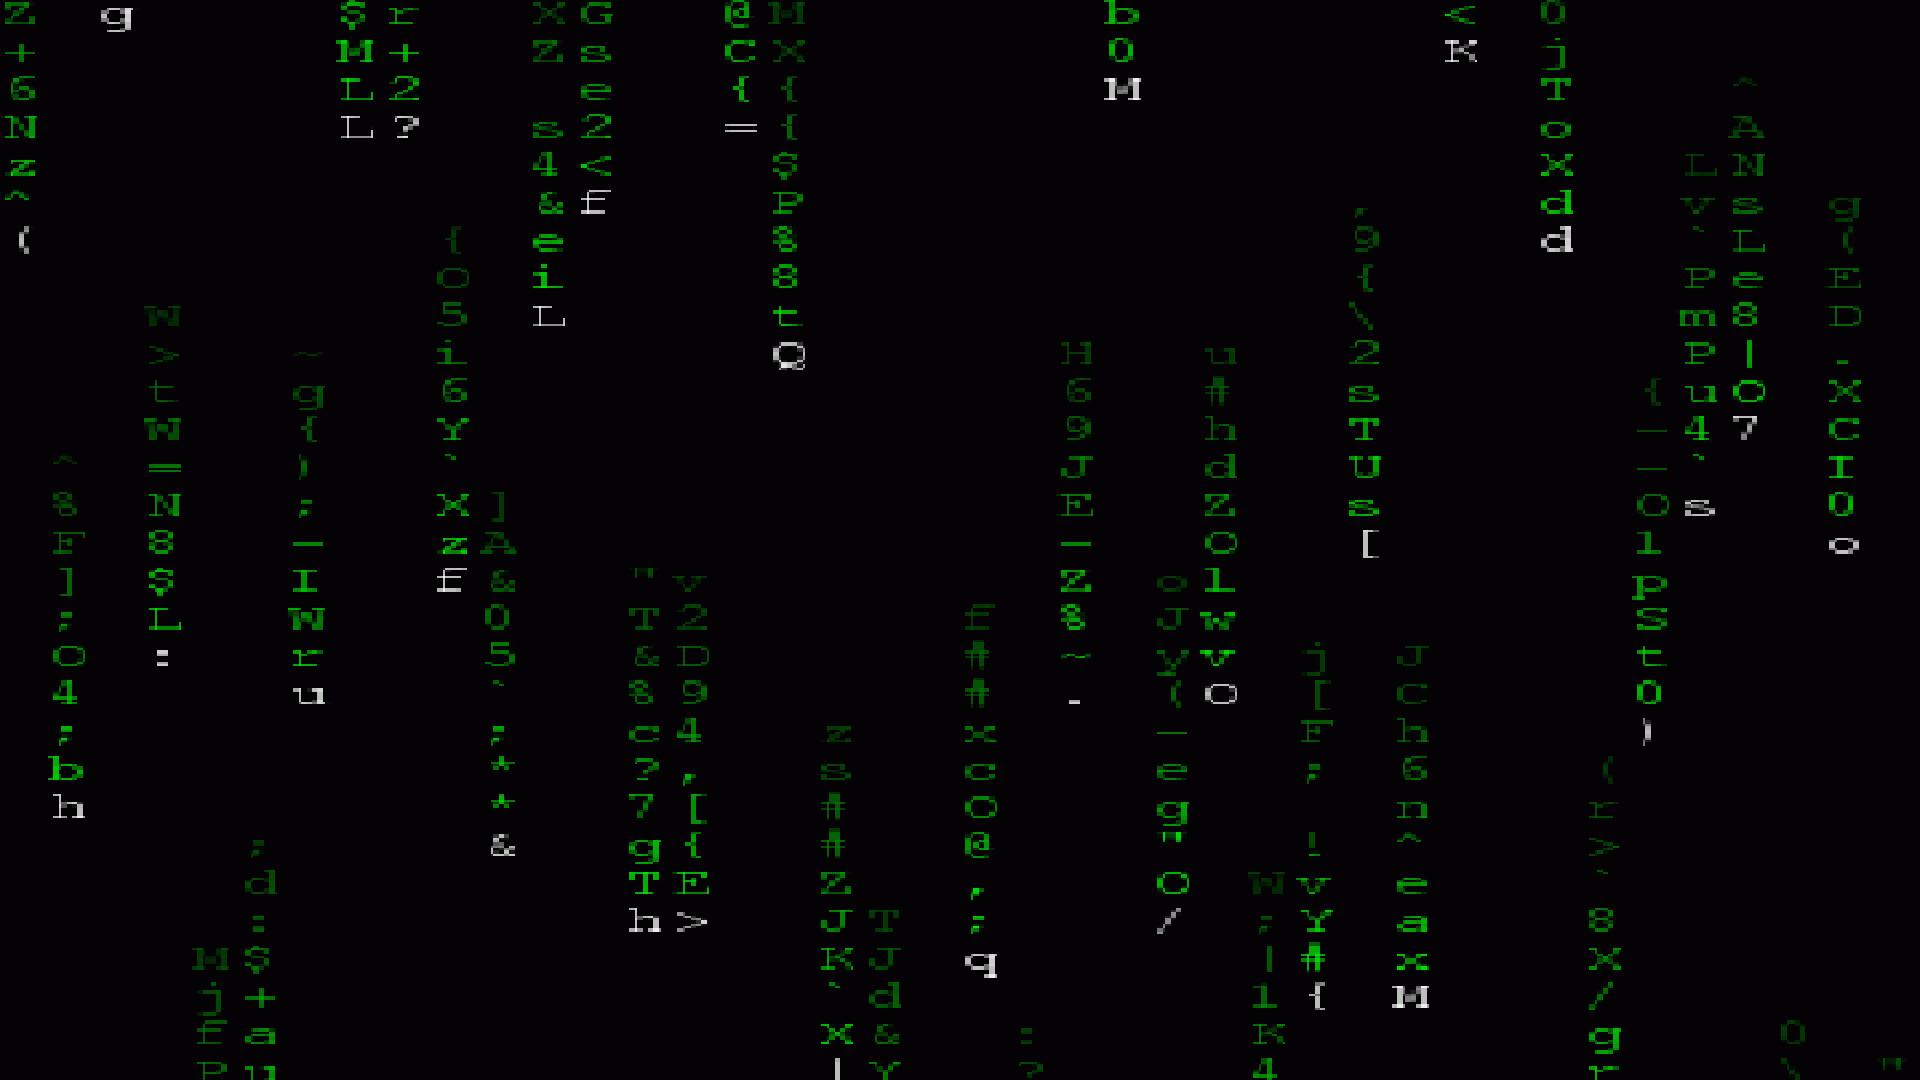 Matrix Moving HD Photo Wallpaper